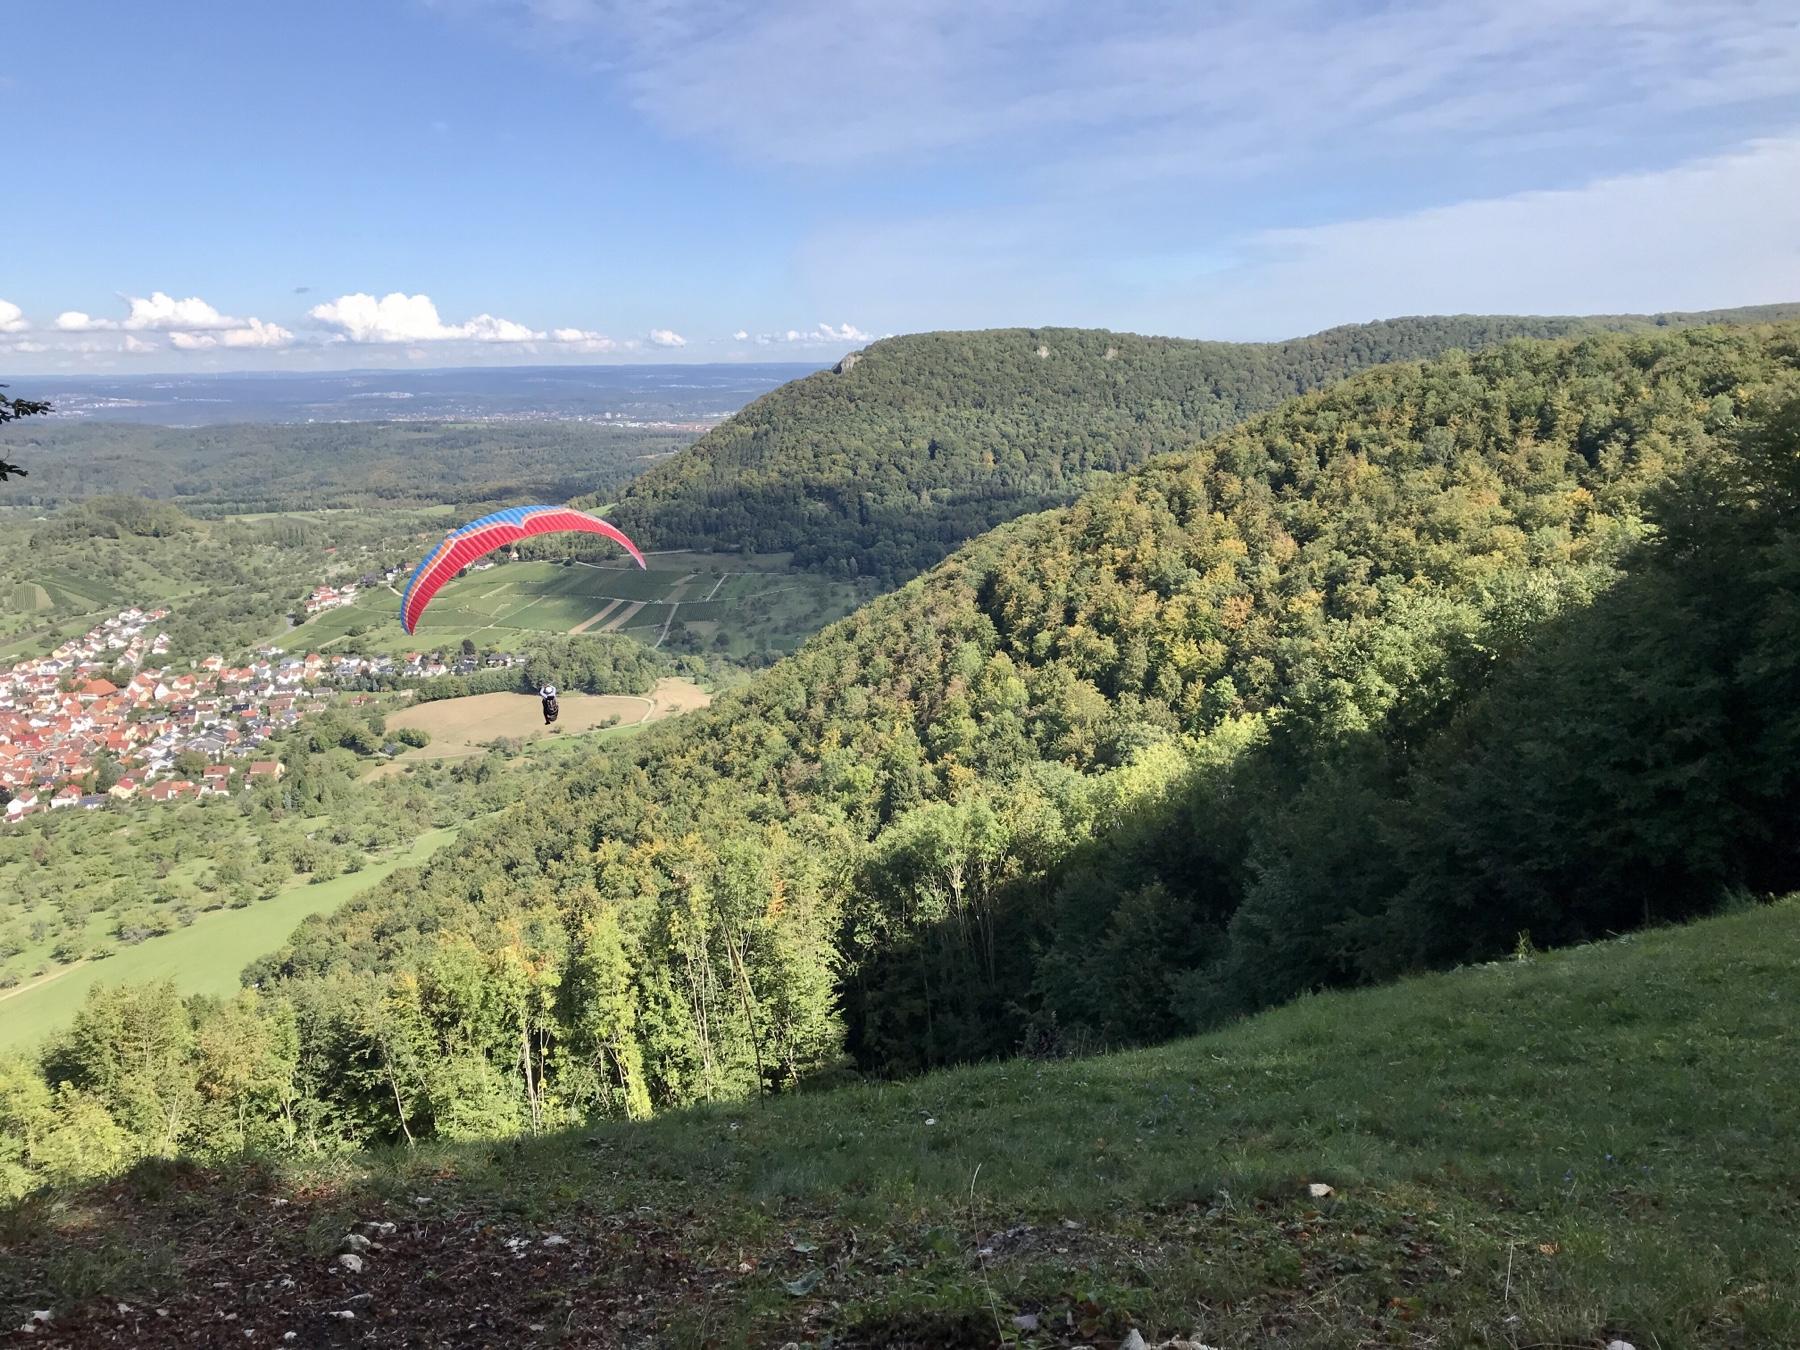 Drachenflieger startet am Albsteig in Richtung Beuren